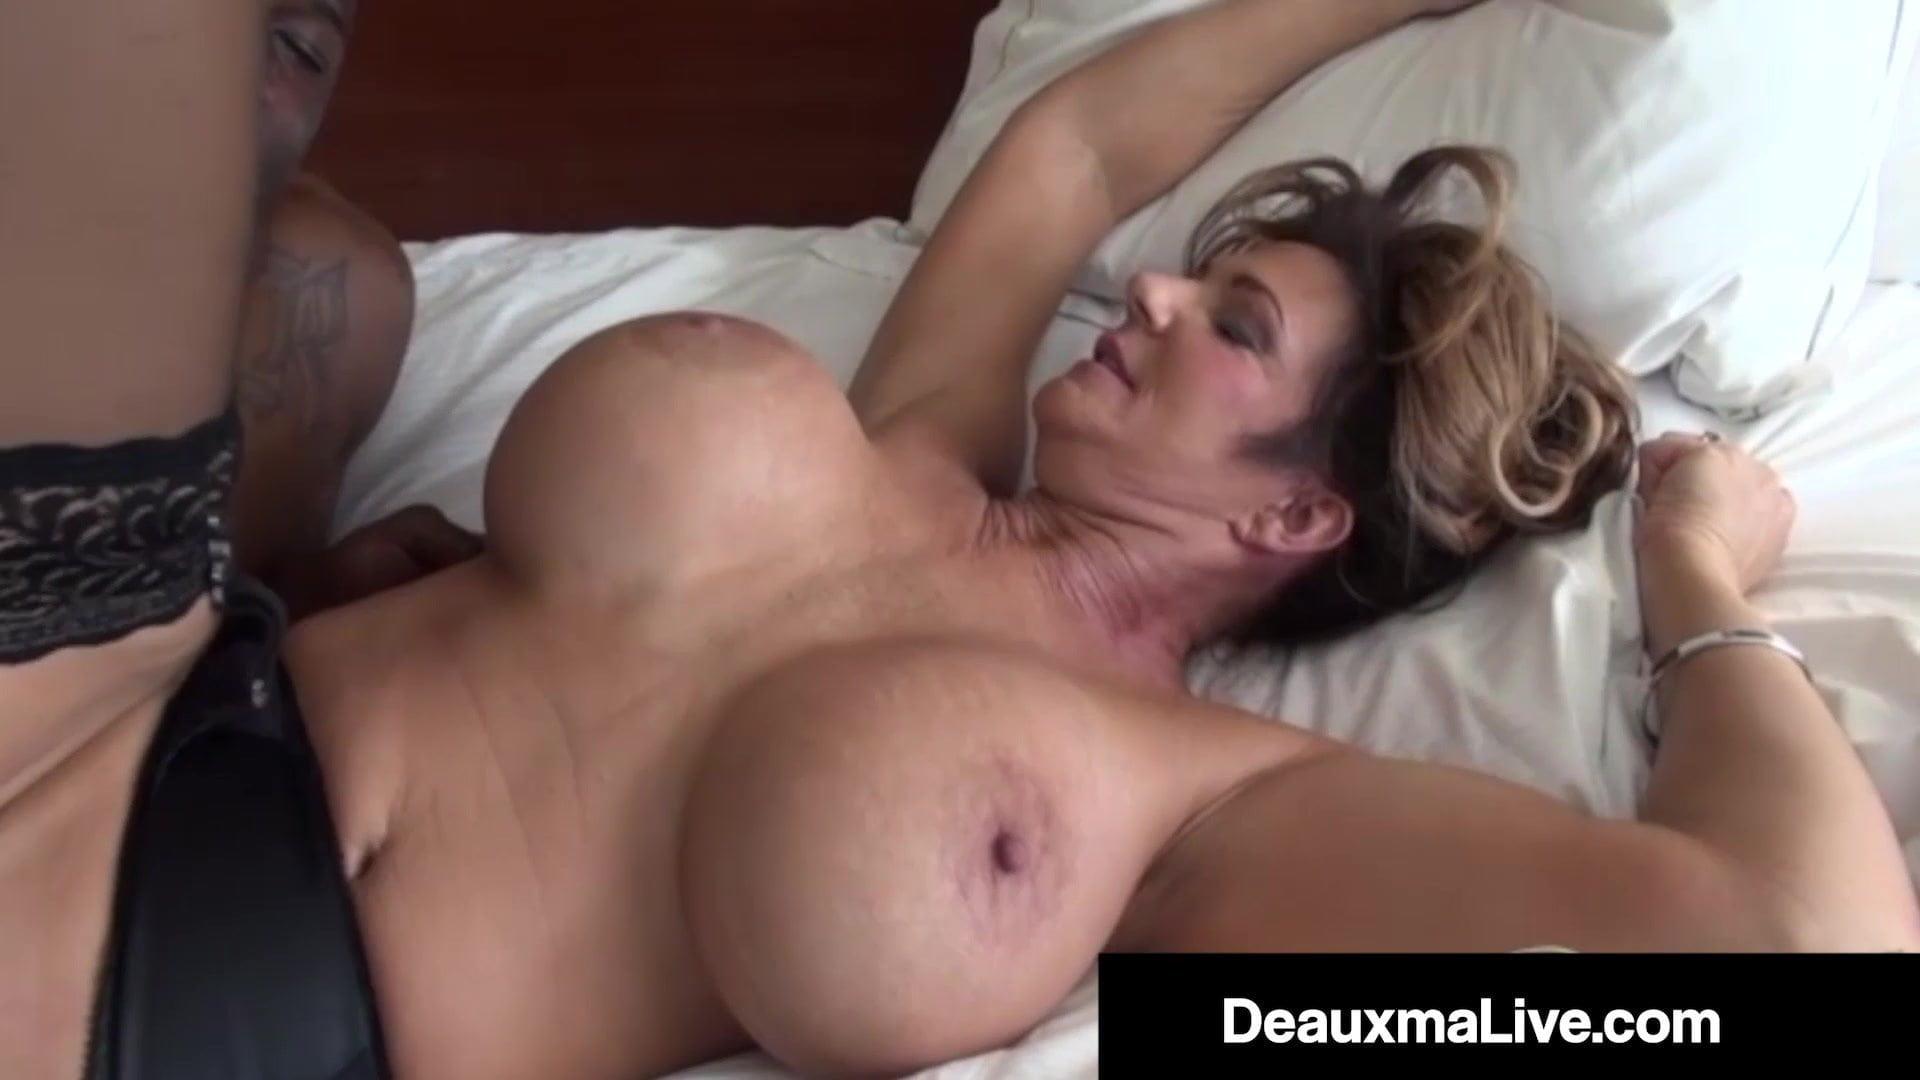 Deauxma Tits